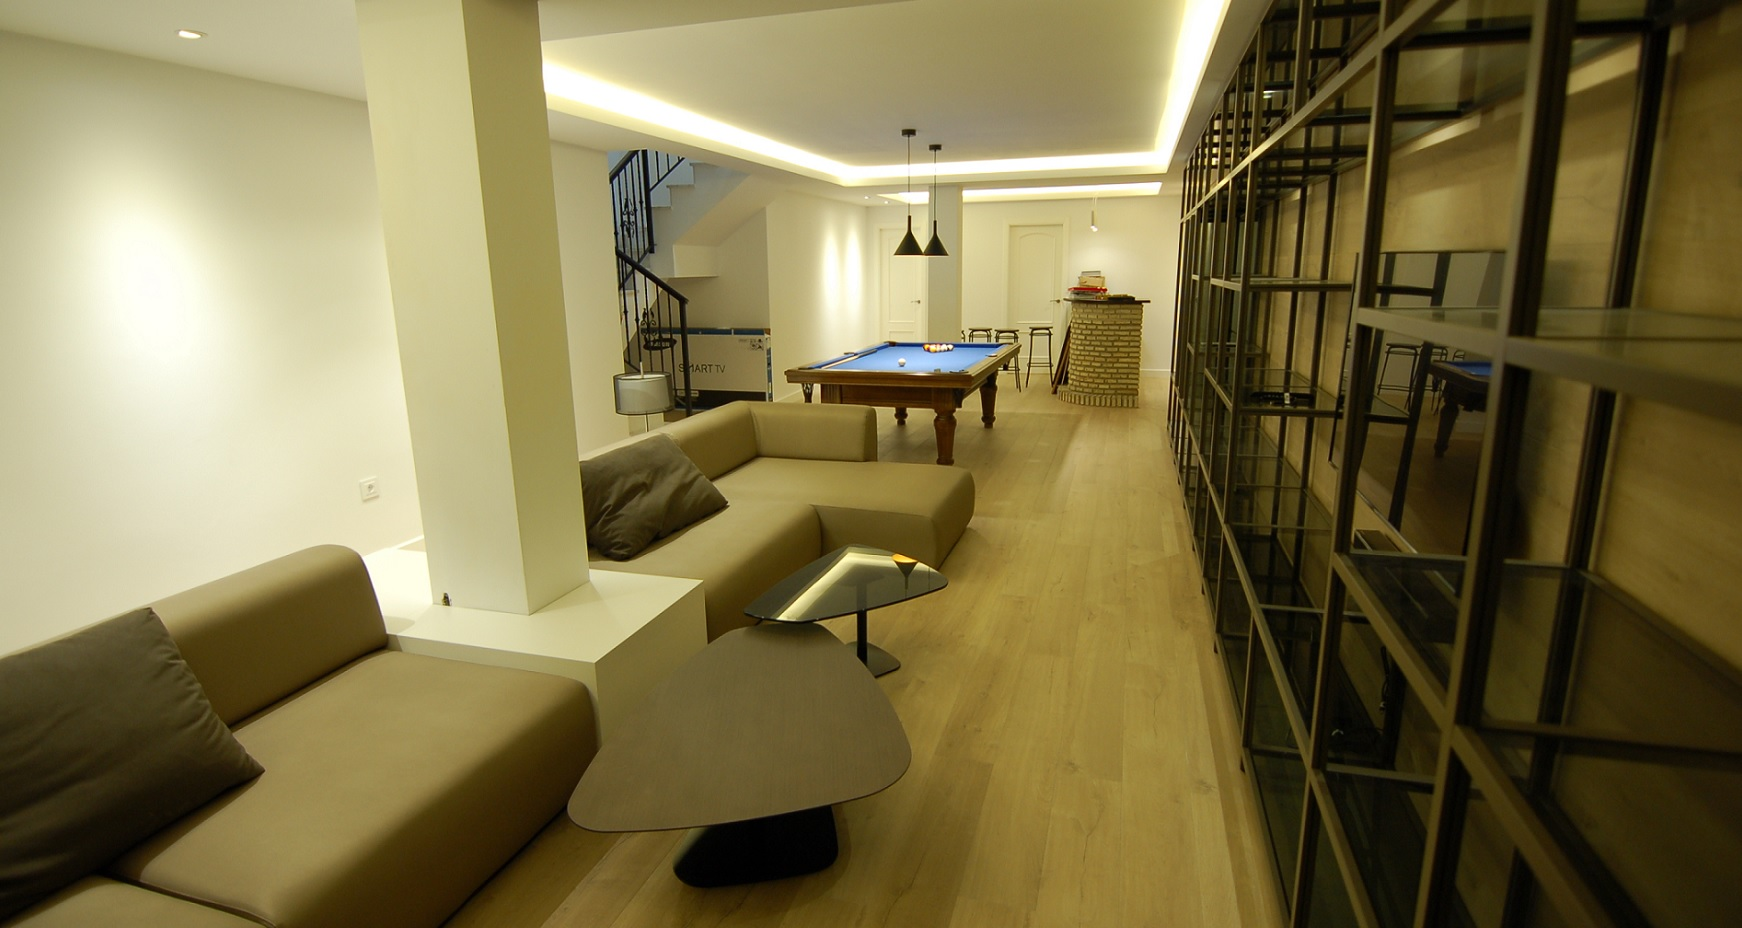 diseño de interiores, interior design cadiz, sevilla malaga